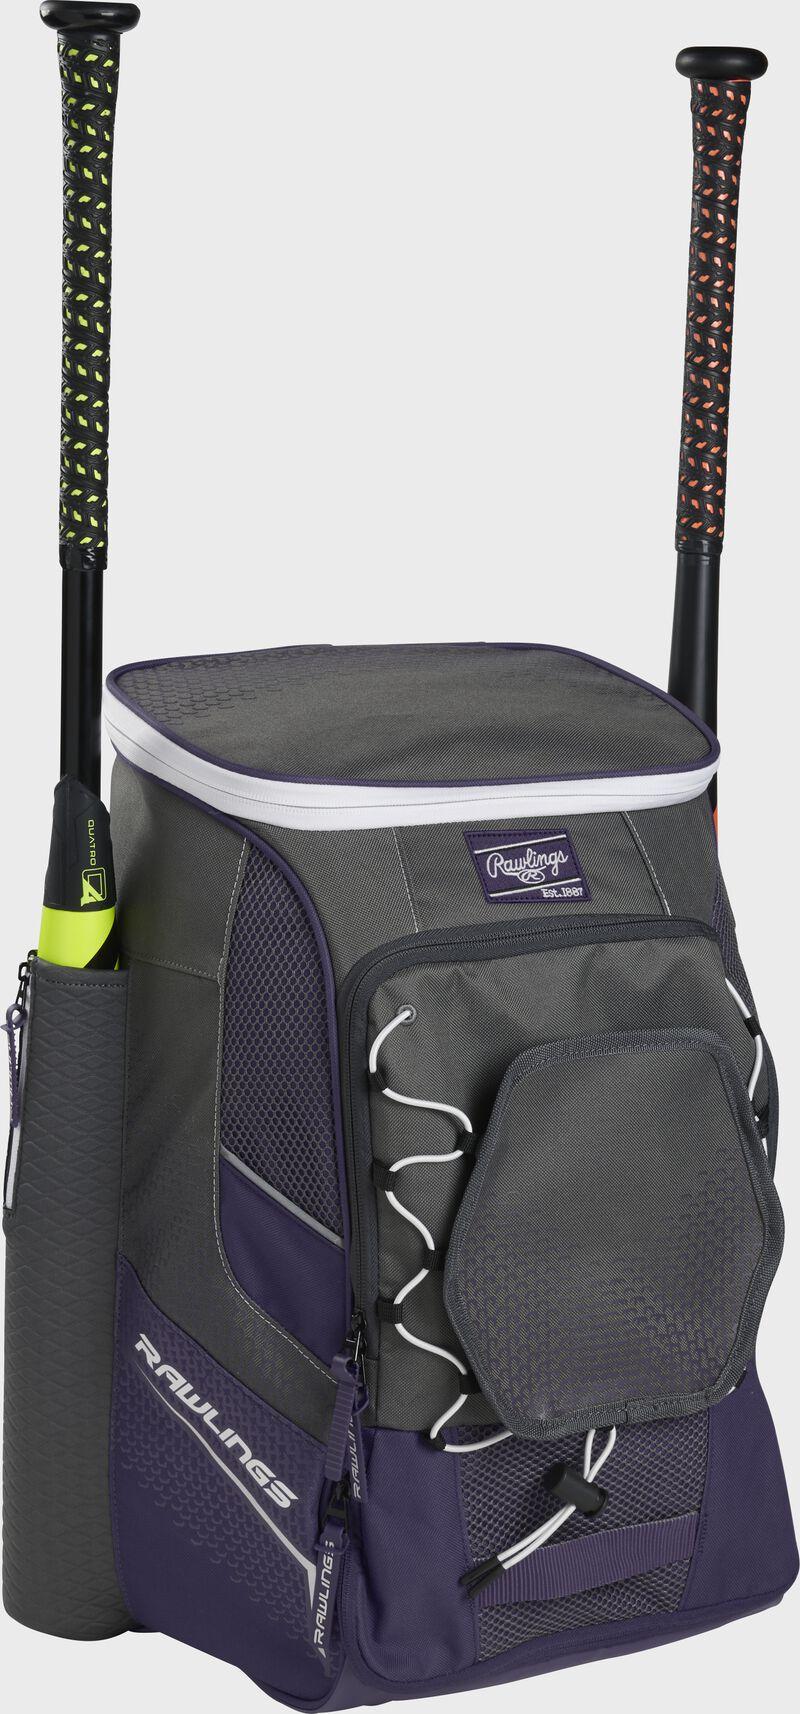 Front left angle of a purple Rawlings Impulse baseball gear backpack with two bats - SKU: IMPLSE-PU